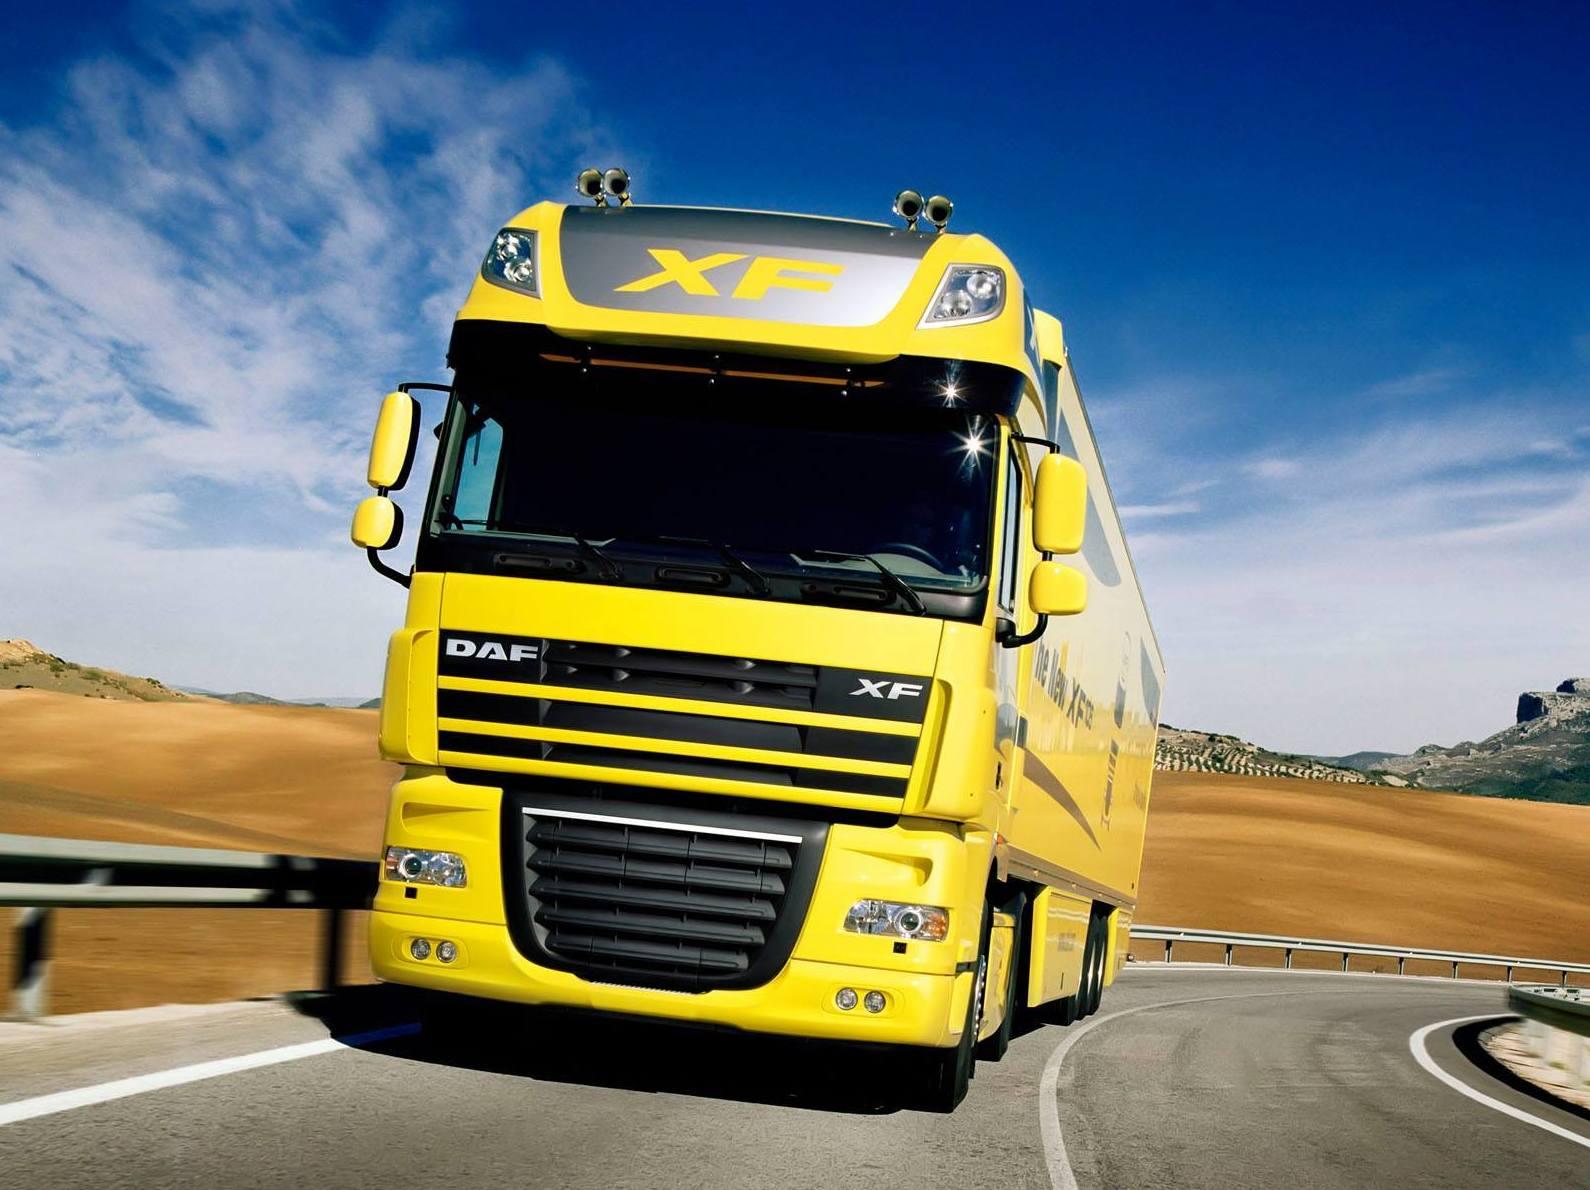 Carné de conducir para camiones